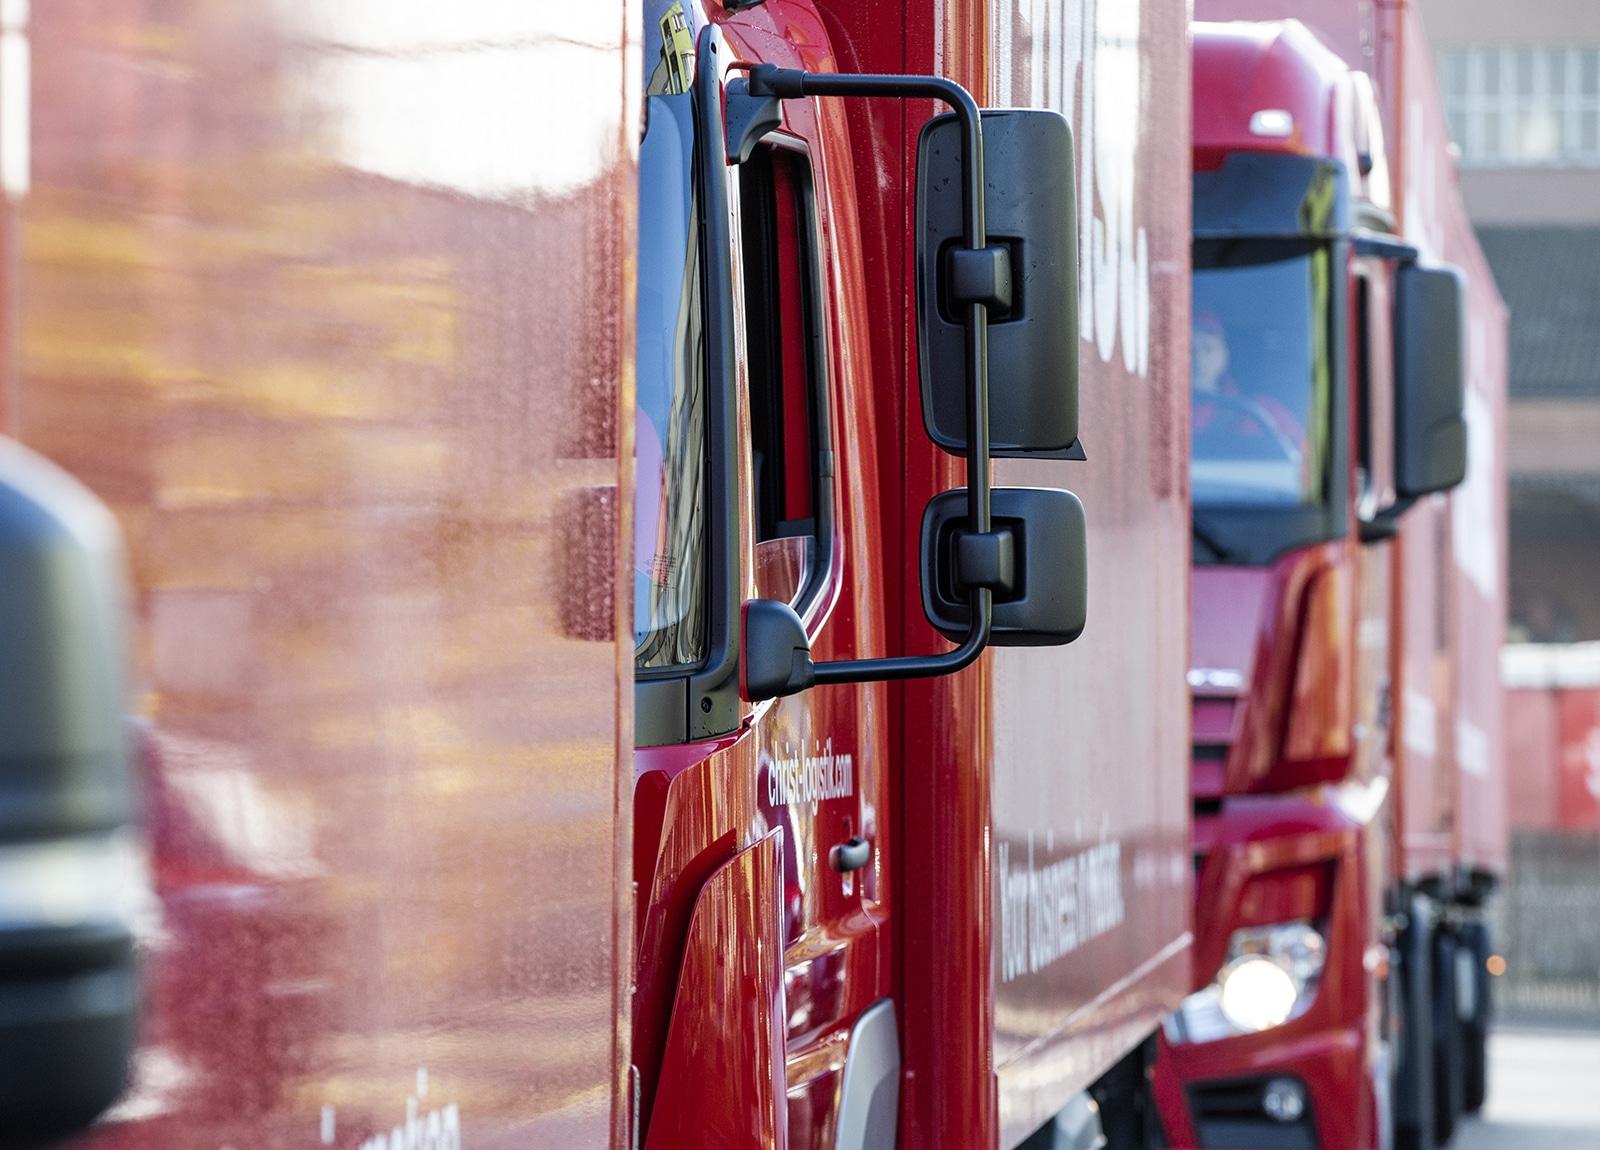 Rote Christ Logistik unternehmens-LKWs